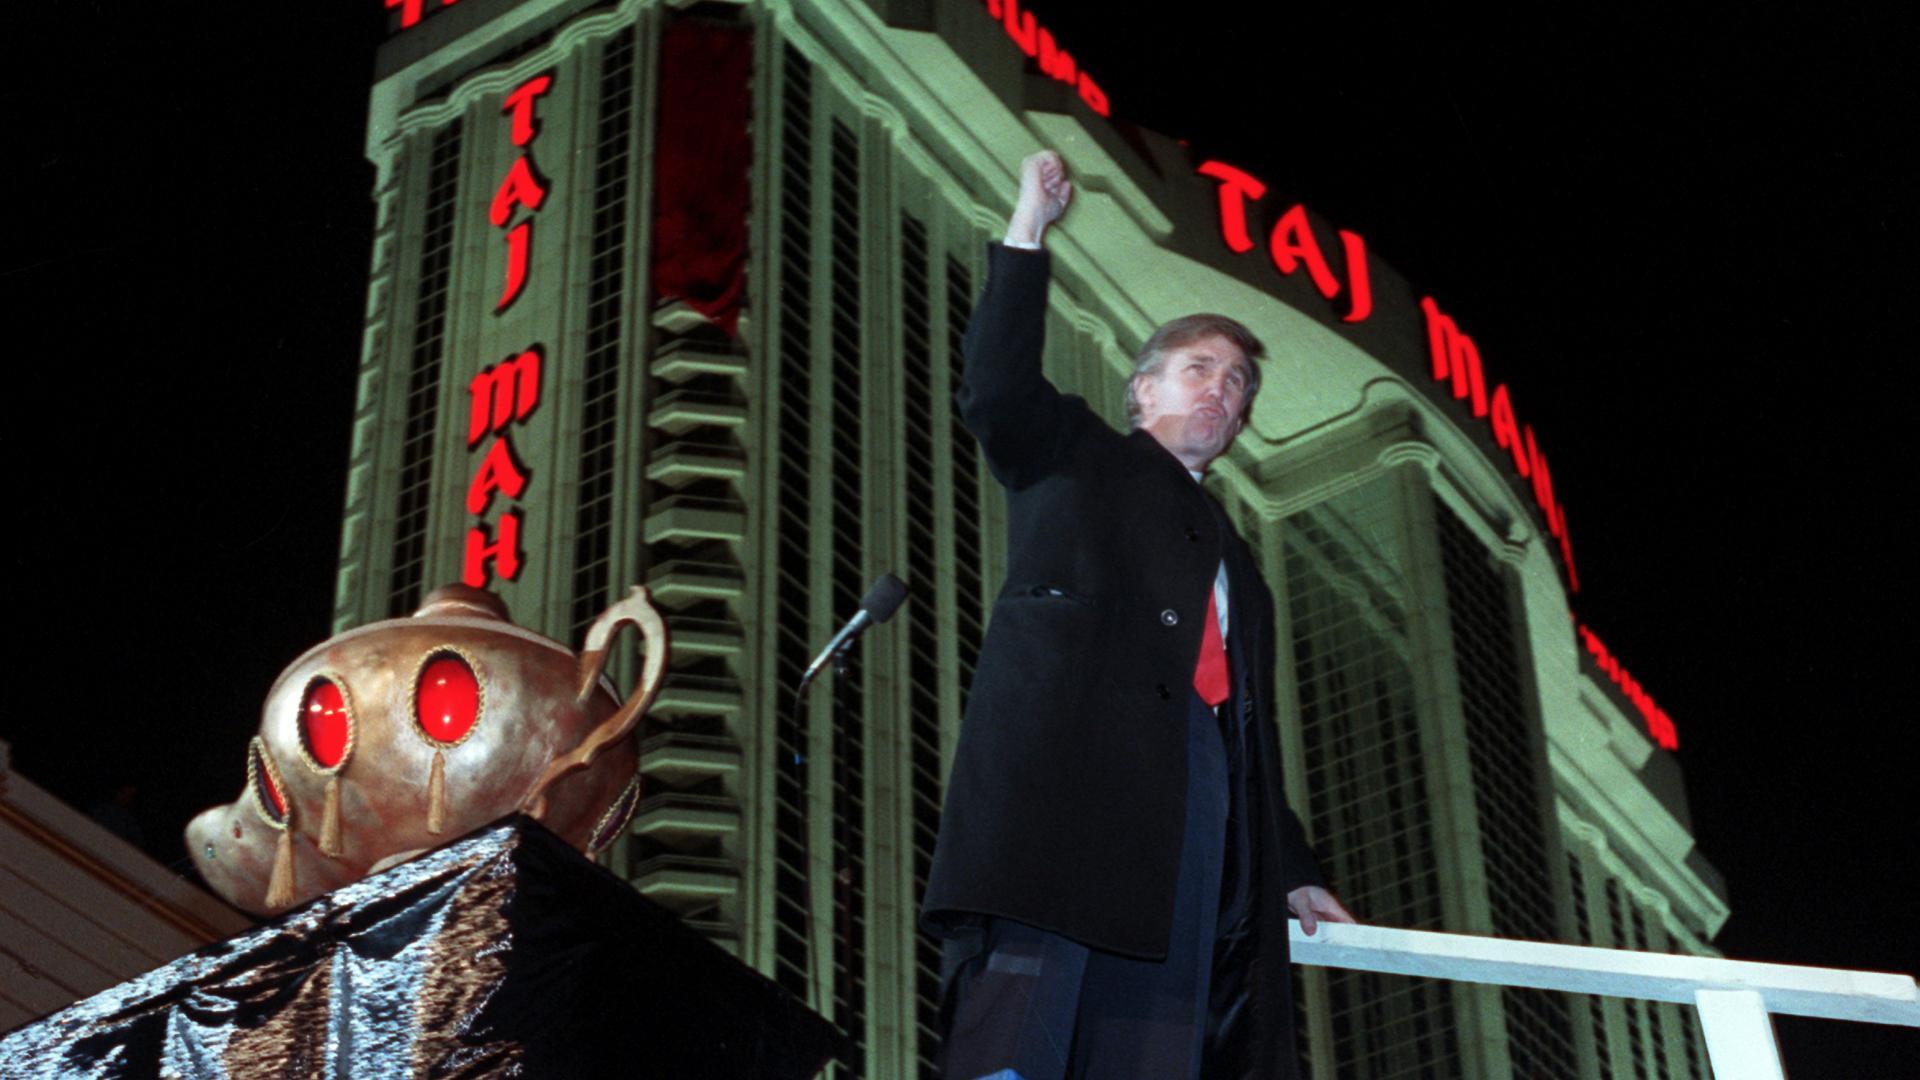 Trump Taj Mahal closes for good following bitter dispute with unions